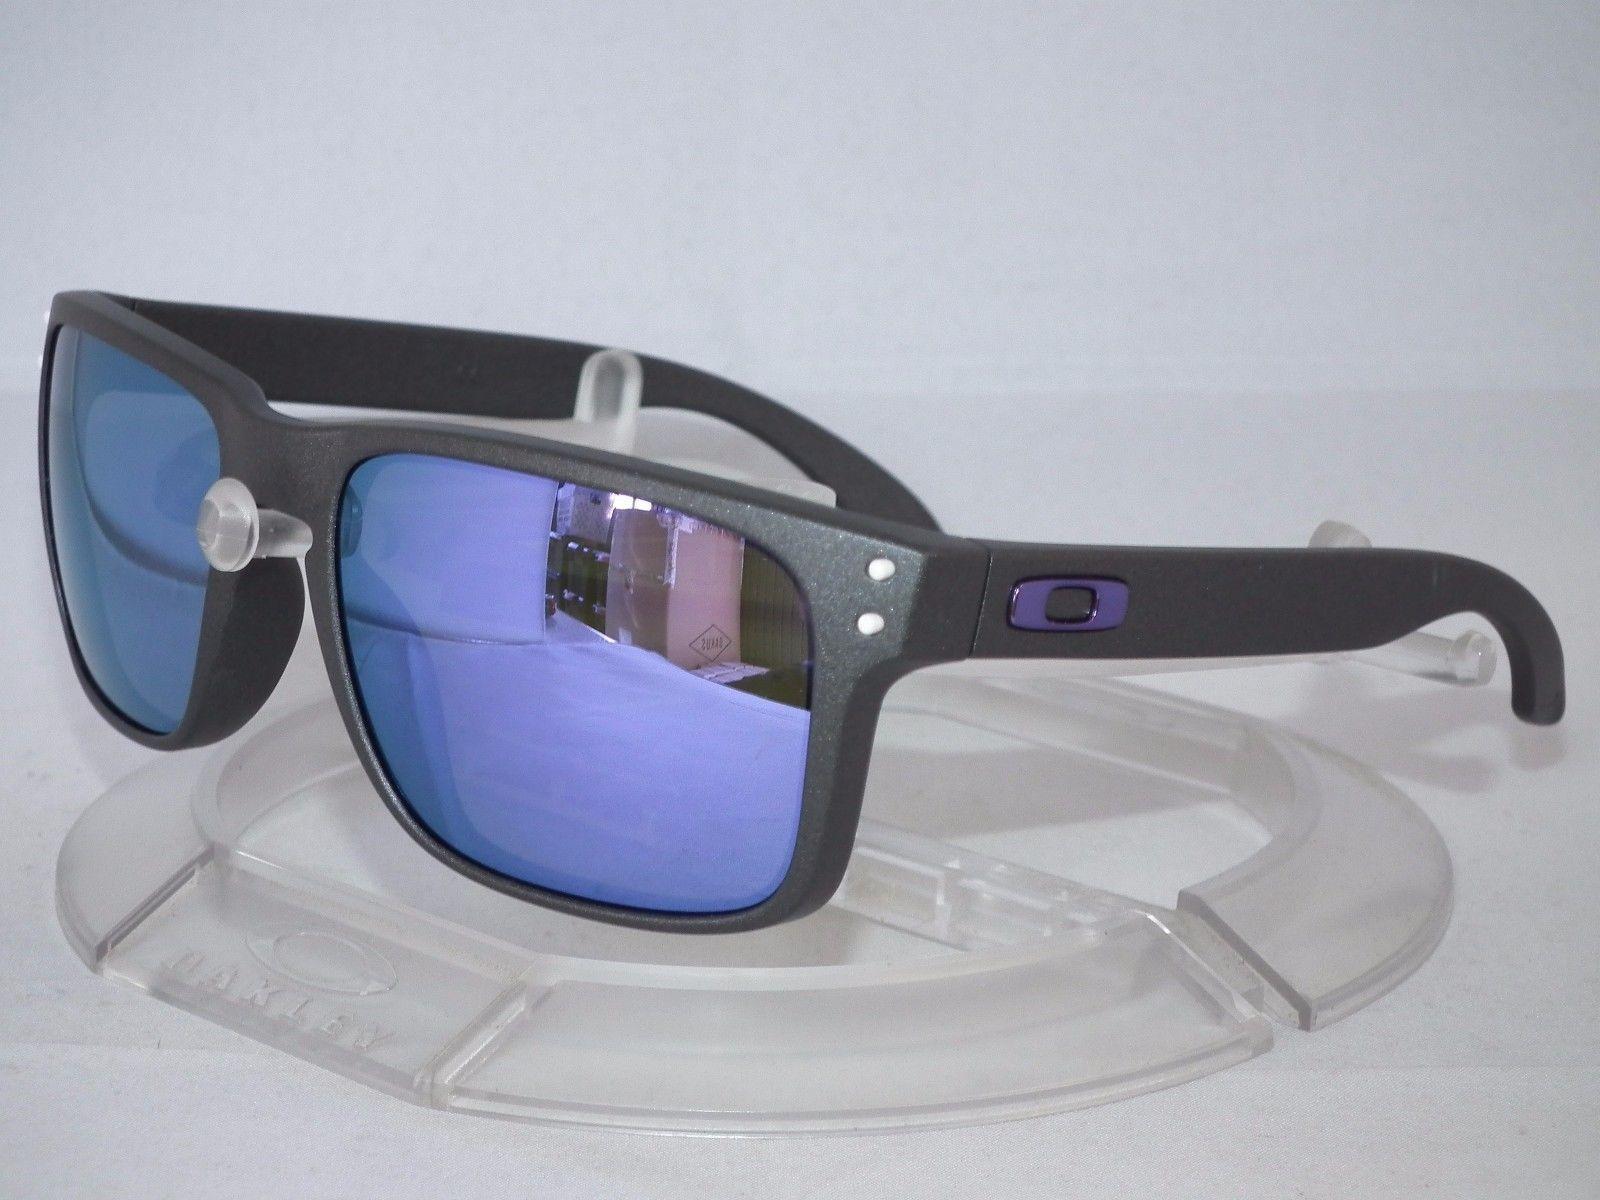 oakley sunglasses oo9102 holbrook ulyg  CUSTOM OAKLEY HOLBROOK Sunglasses OO9102 Steel Grey / Violet Iridium